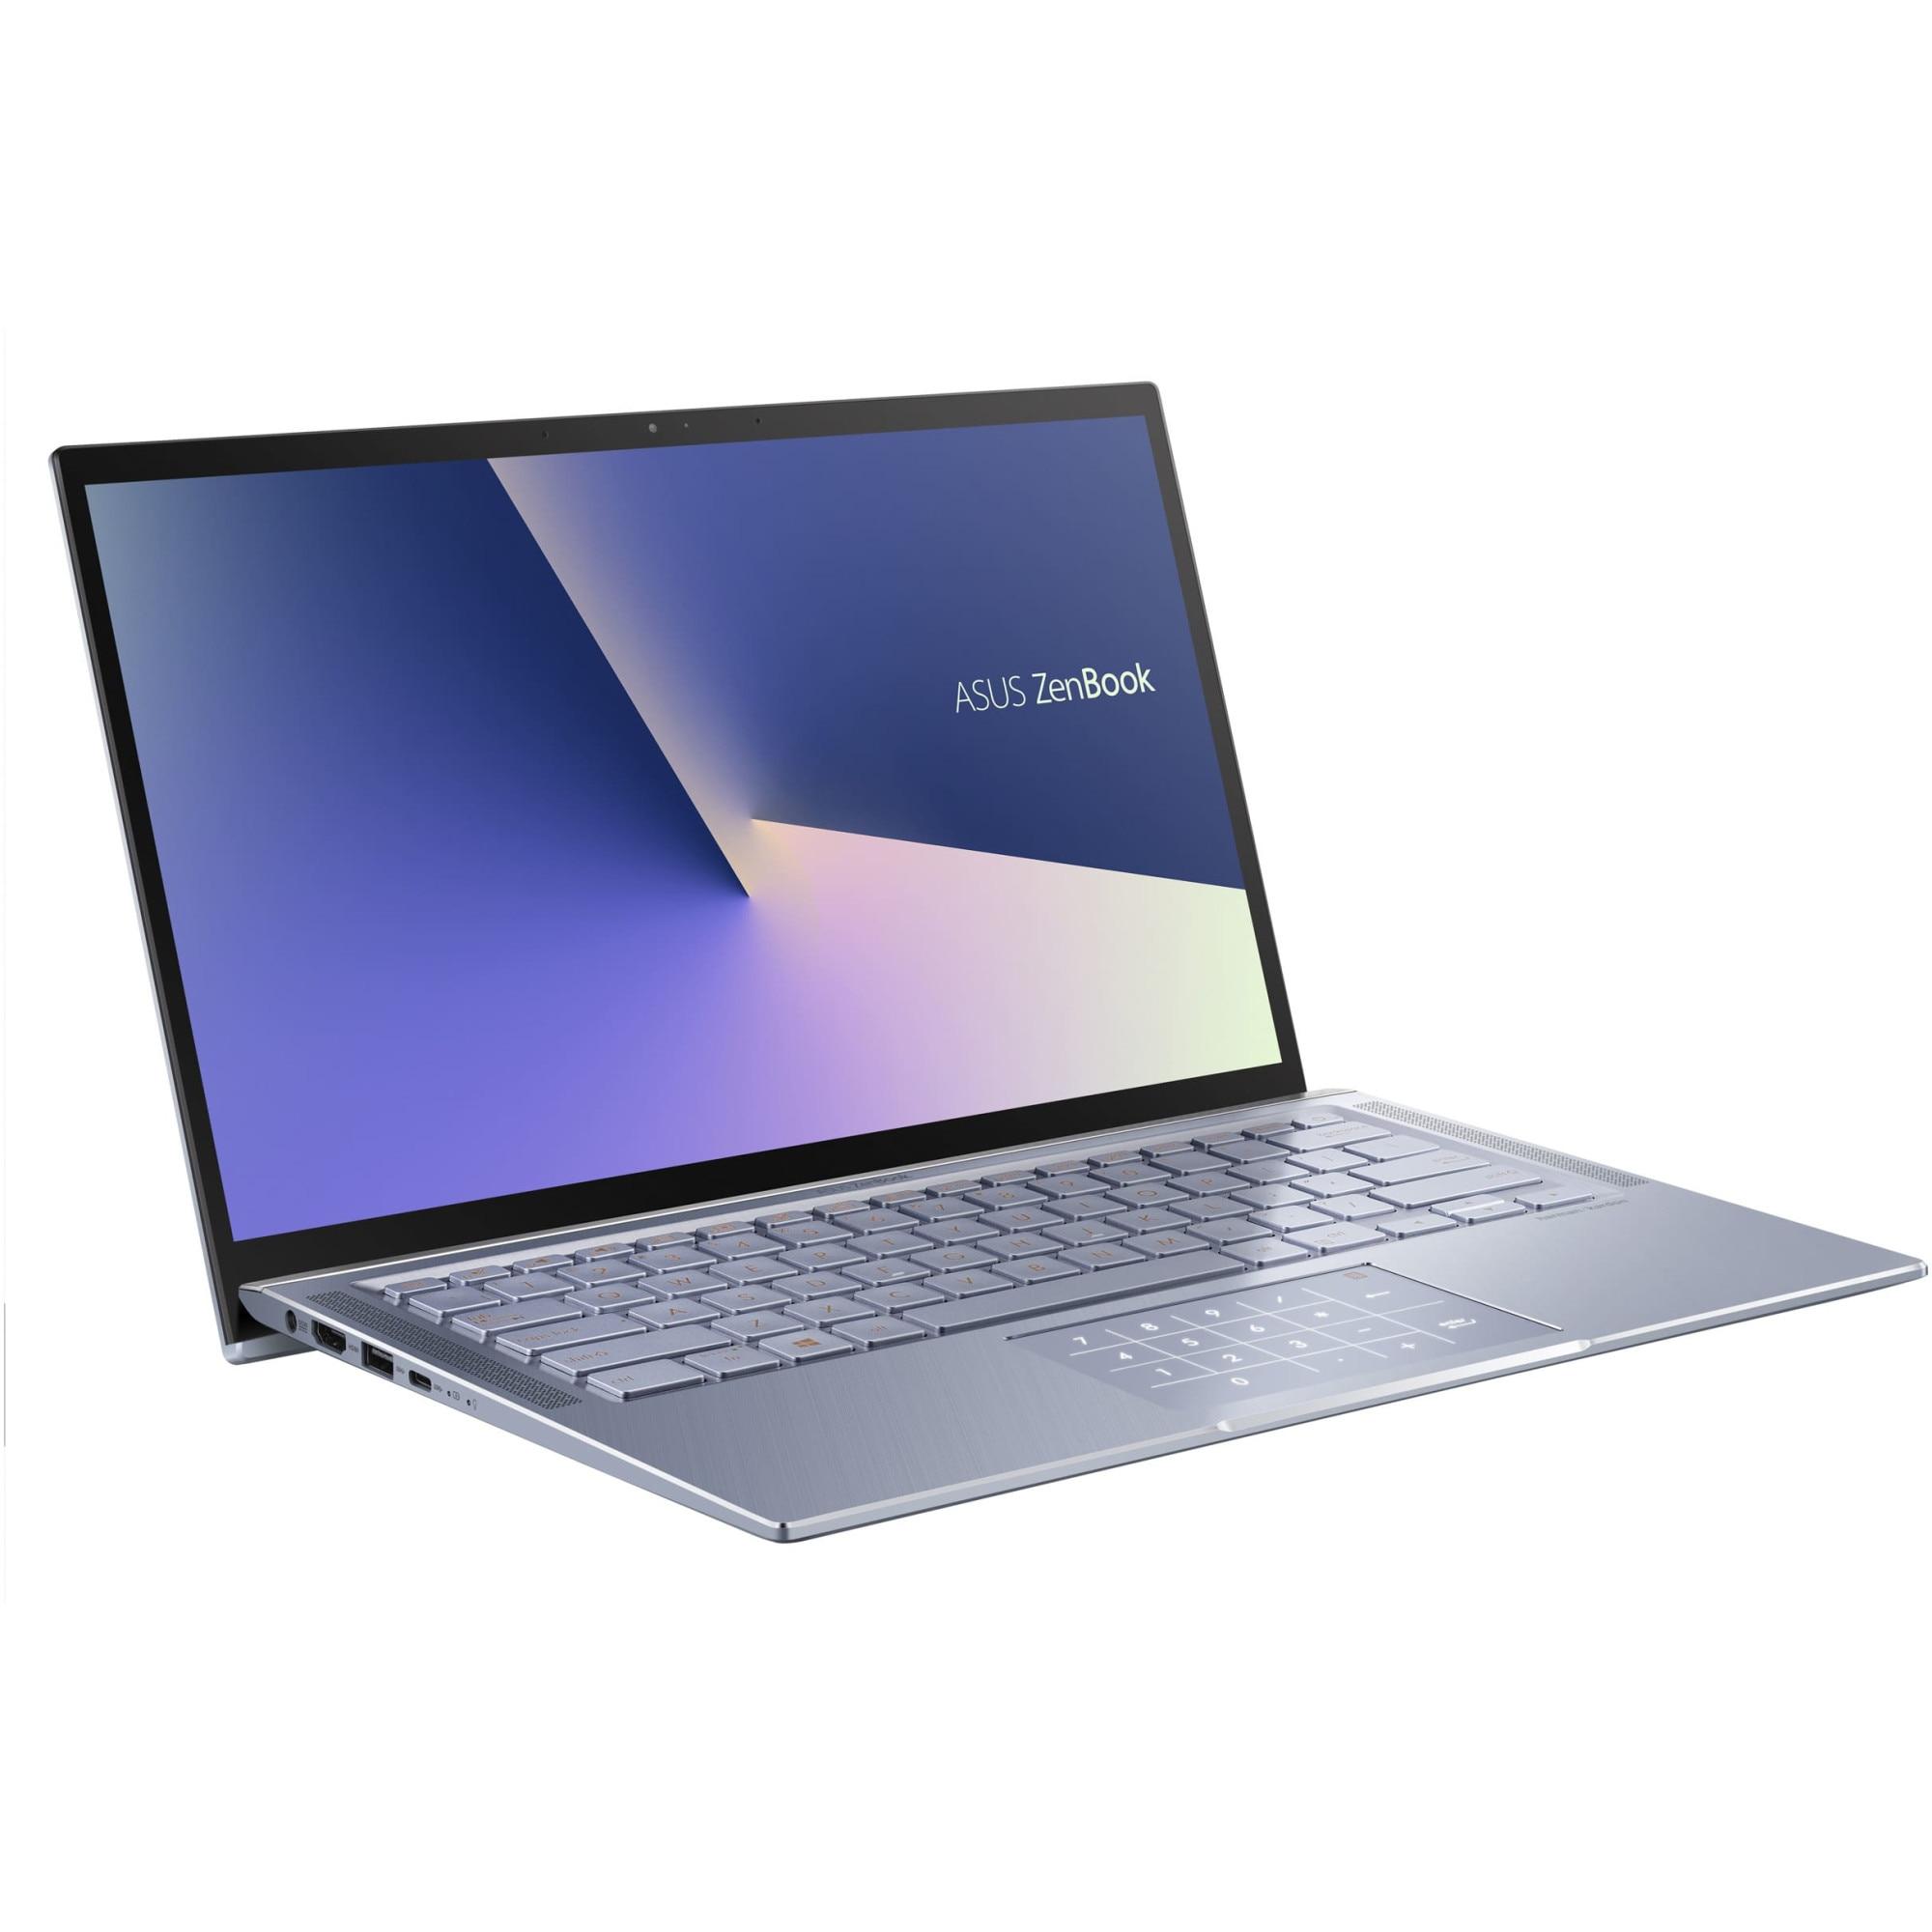 "Fotografie Laptop ultraportabil ASUS ZenBook UM431DA cu procesor AMD® Ryzen 5 3500U pana la 3.70 GHz, 14"", Full HD, 8GB, 1TB SSD, AMD Radeon™ Vega 8 Graphics, Endless OS, Utopia Blue Metal"